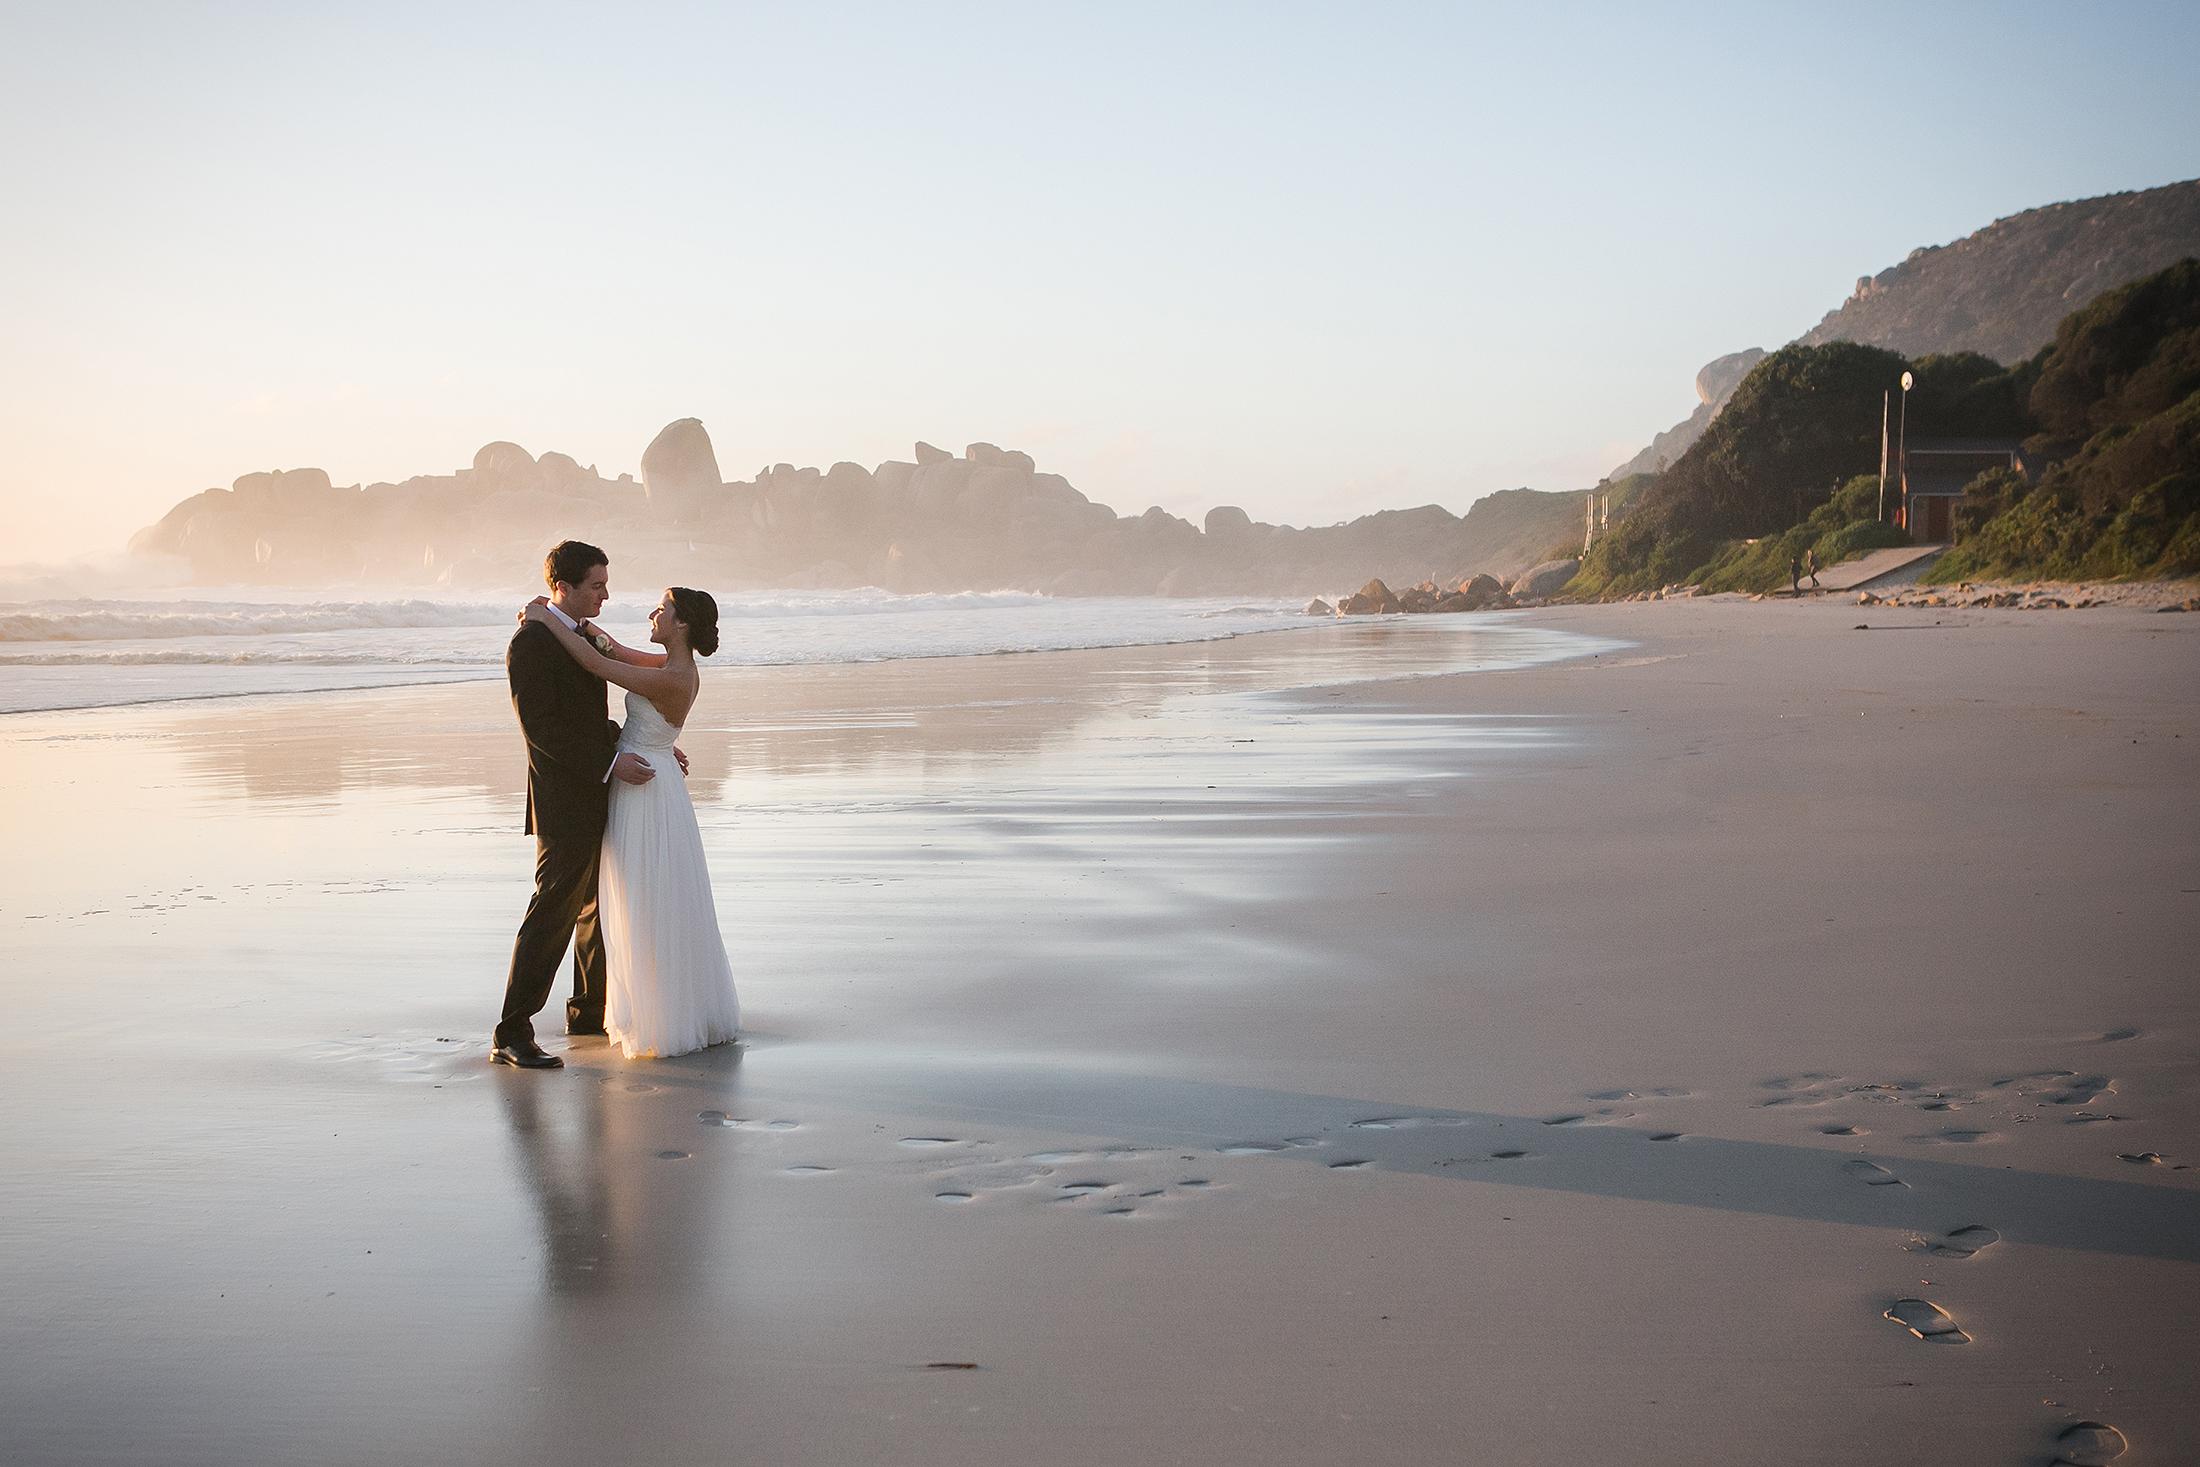 Wedding photographer homepage slider image_002